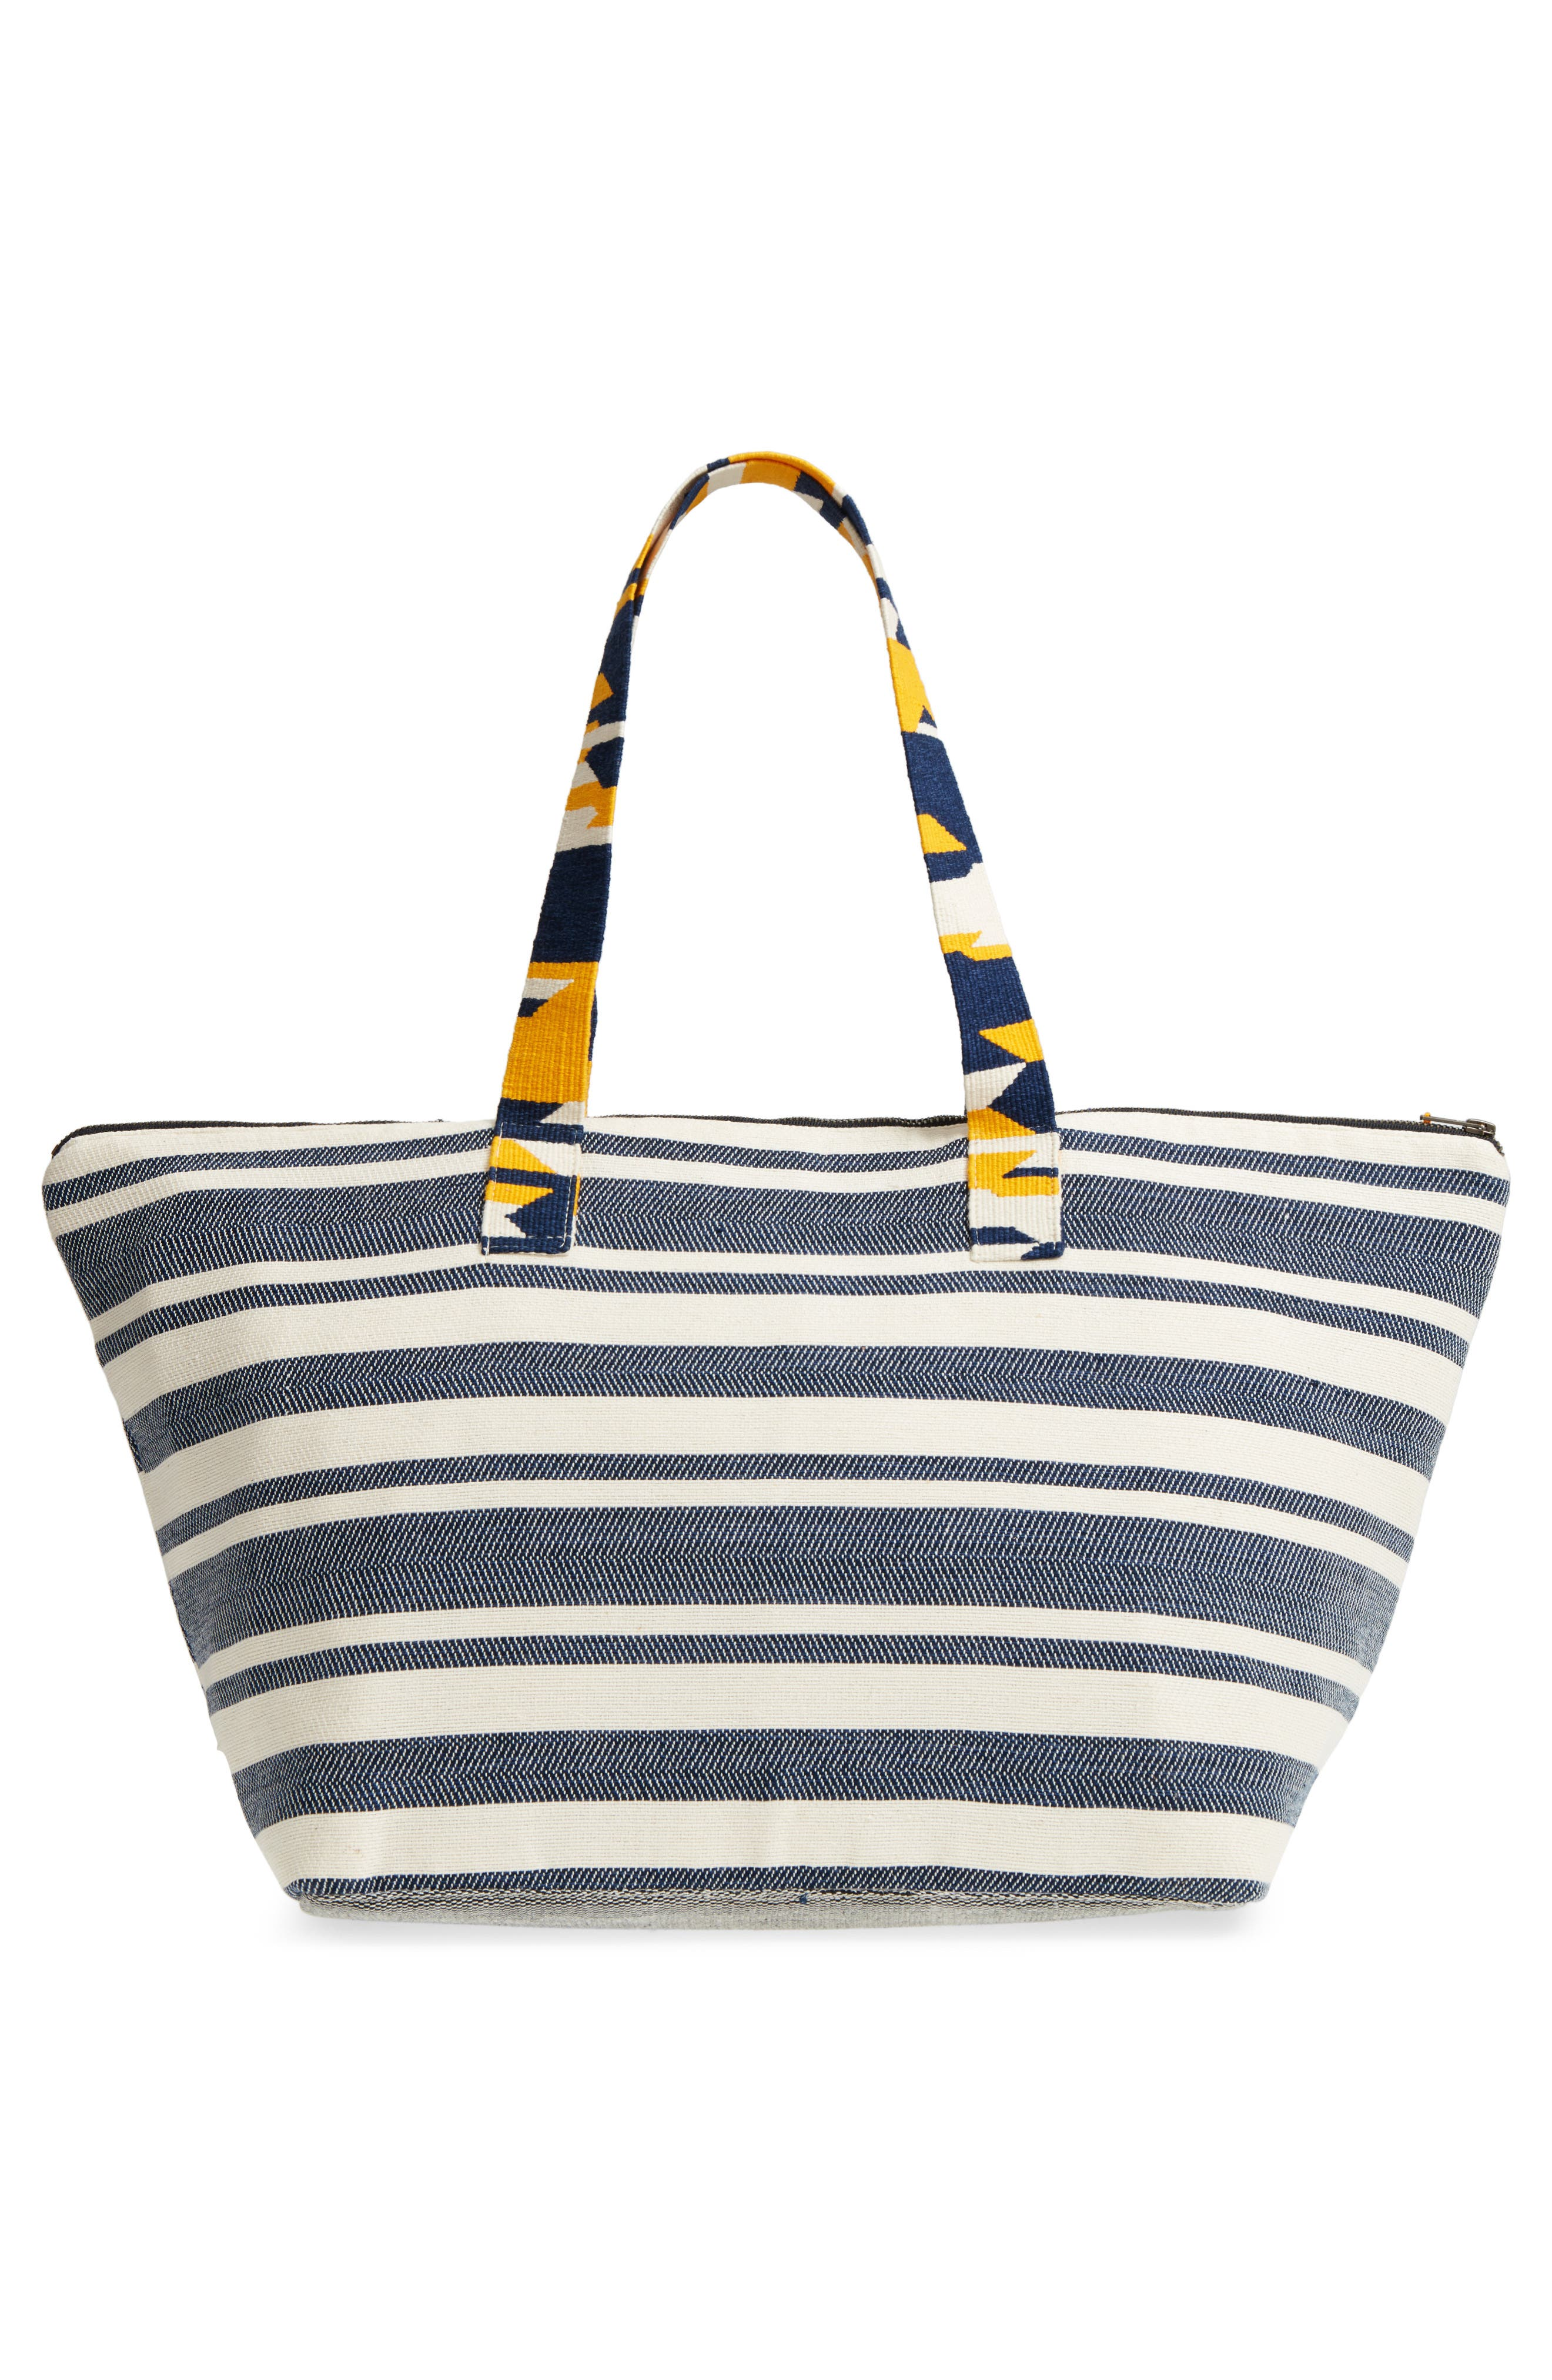 Iris Beach Bag,                             Alternate thumbnail 3, color,                             400